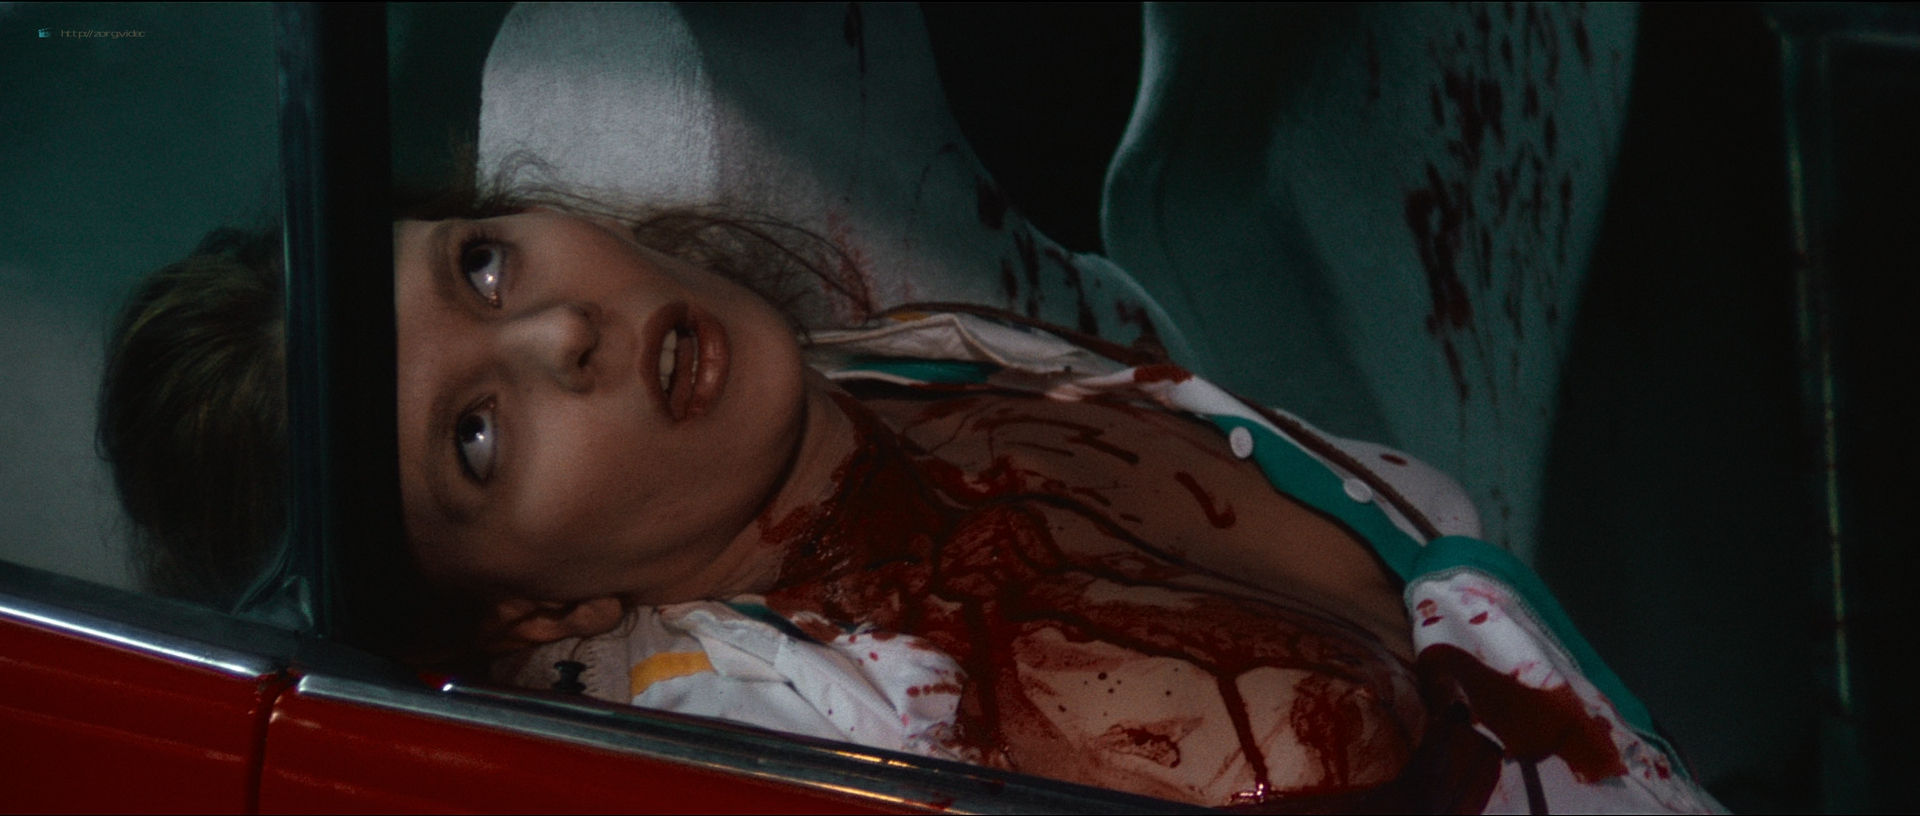 Daniela Doria nude full frontal Zora Kerova and other nude - The New York Ripper (IT-1982) HD 1080p BluRay(r) (18)